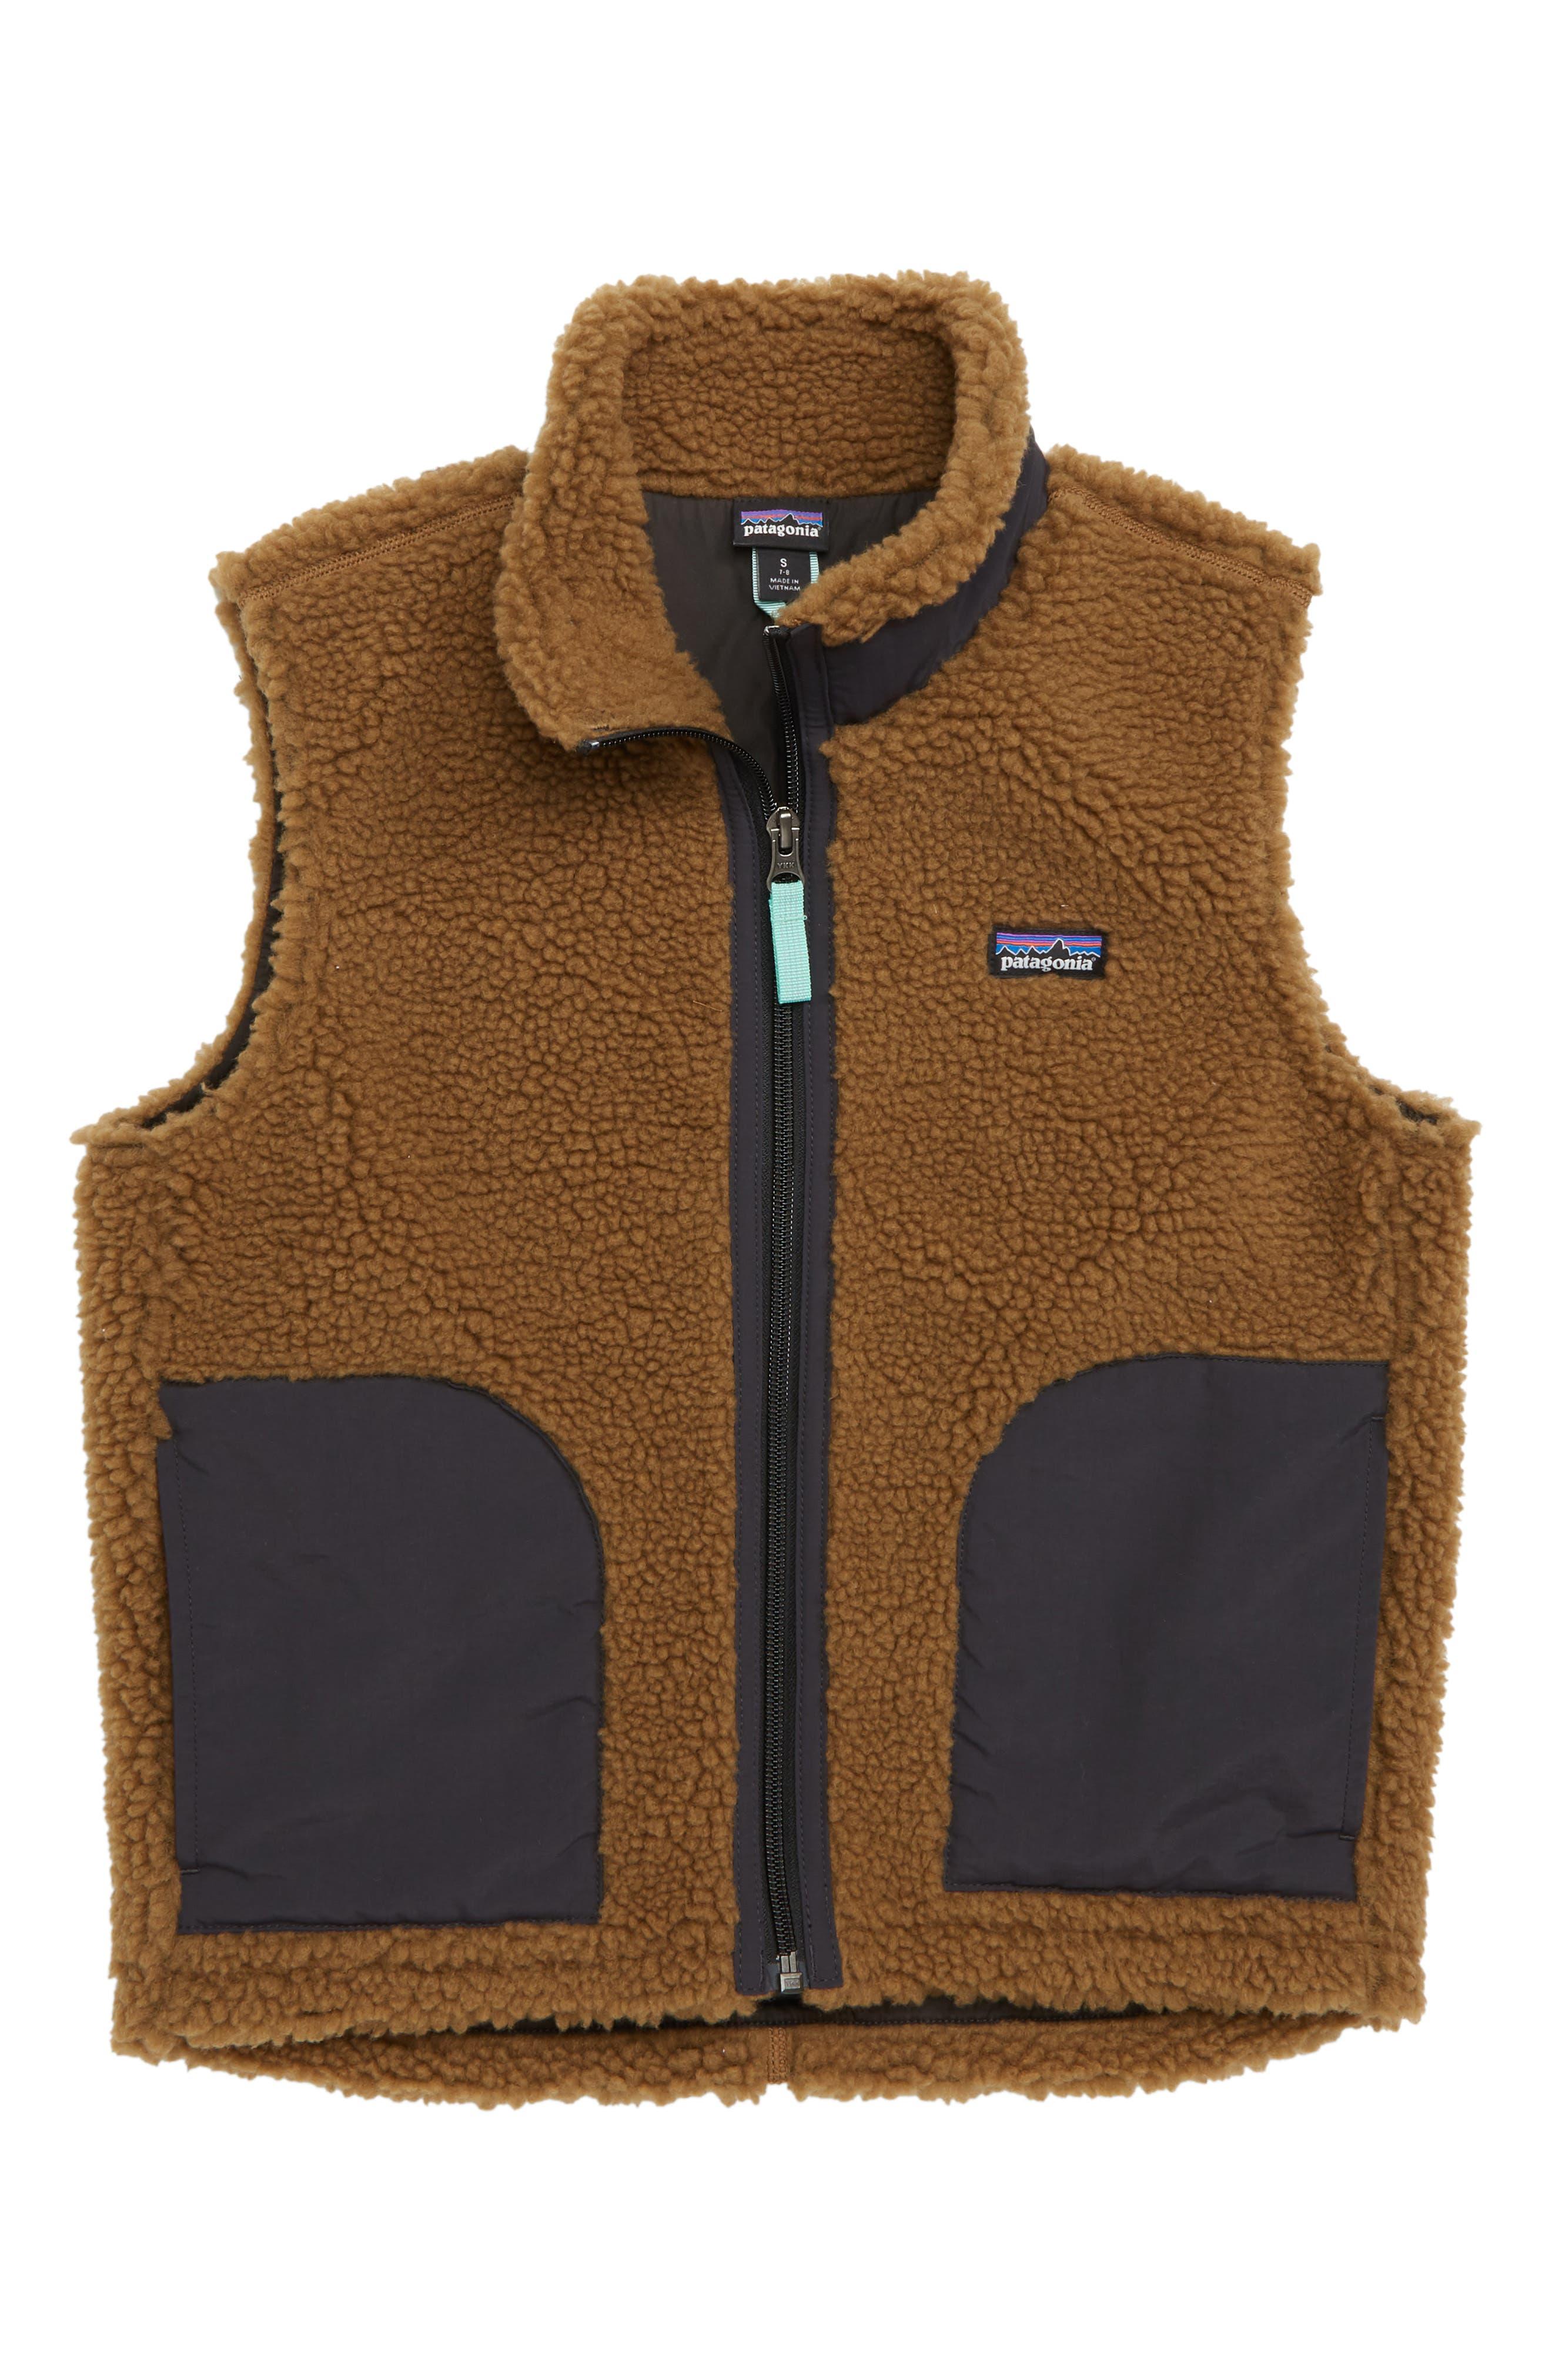 PATAGONIA,                             Retro-X<sup>®</sup> Fleece Vest,                             Main thumbnail 1, color,                             200